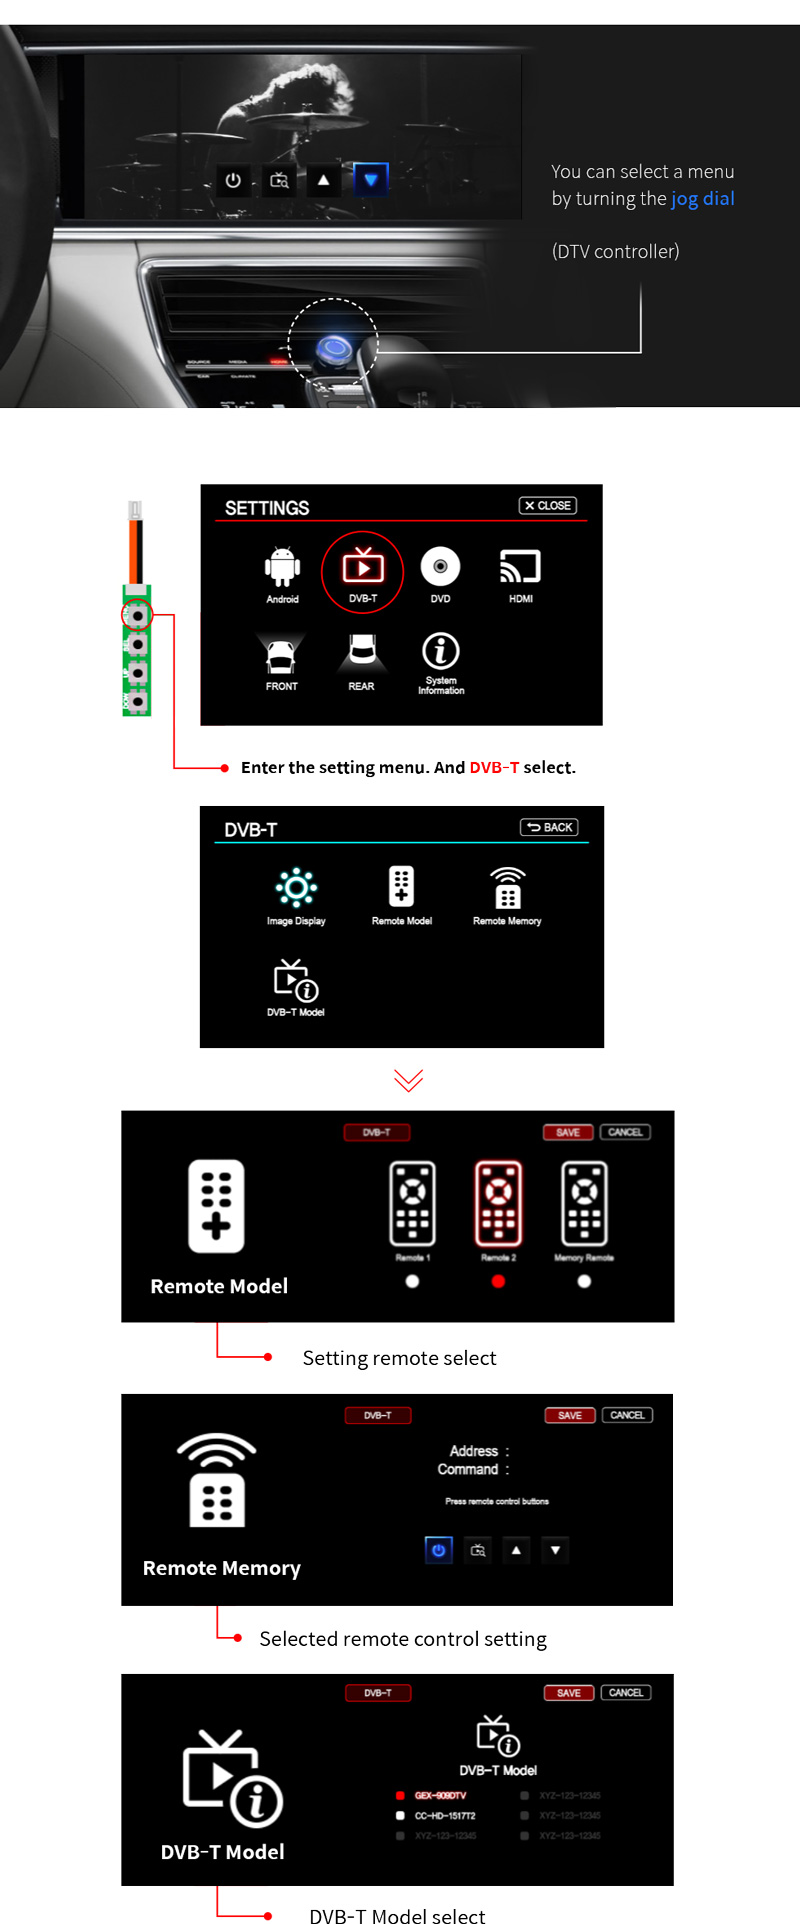 07_remotecontrol_setting.jpg